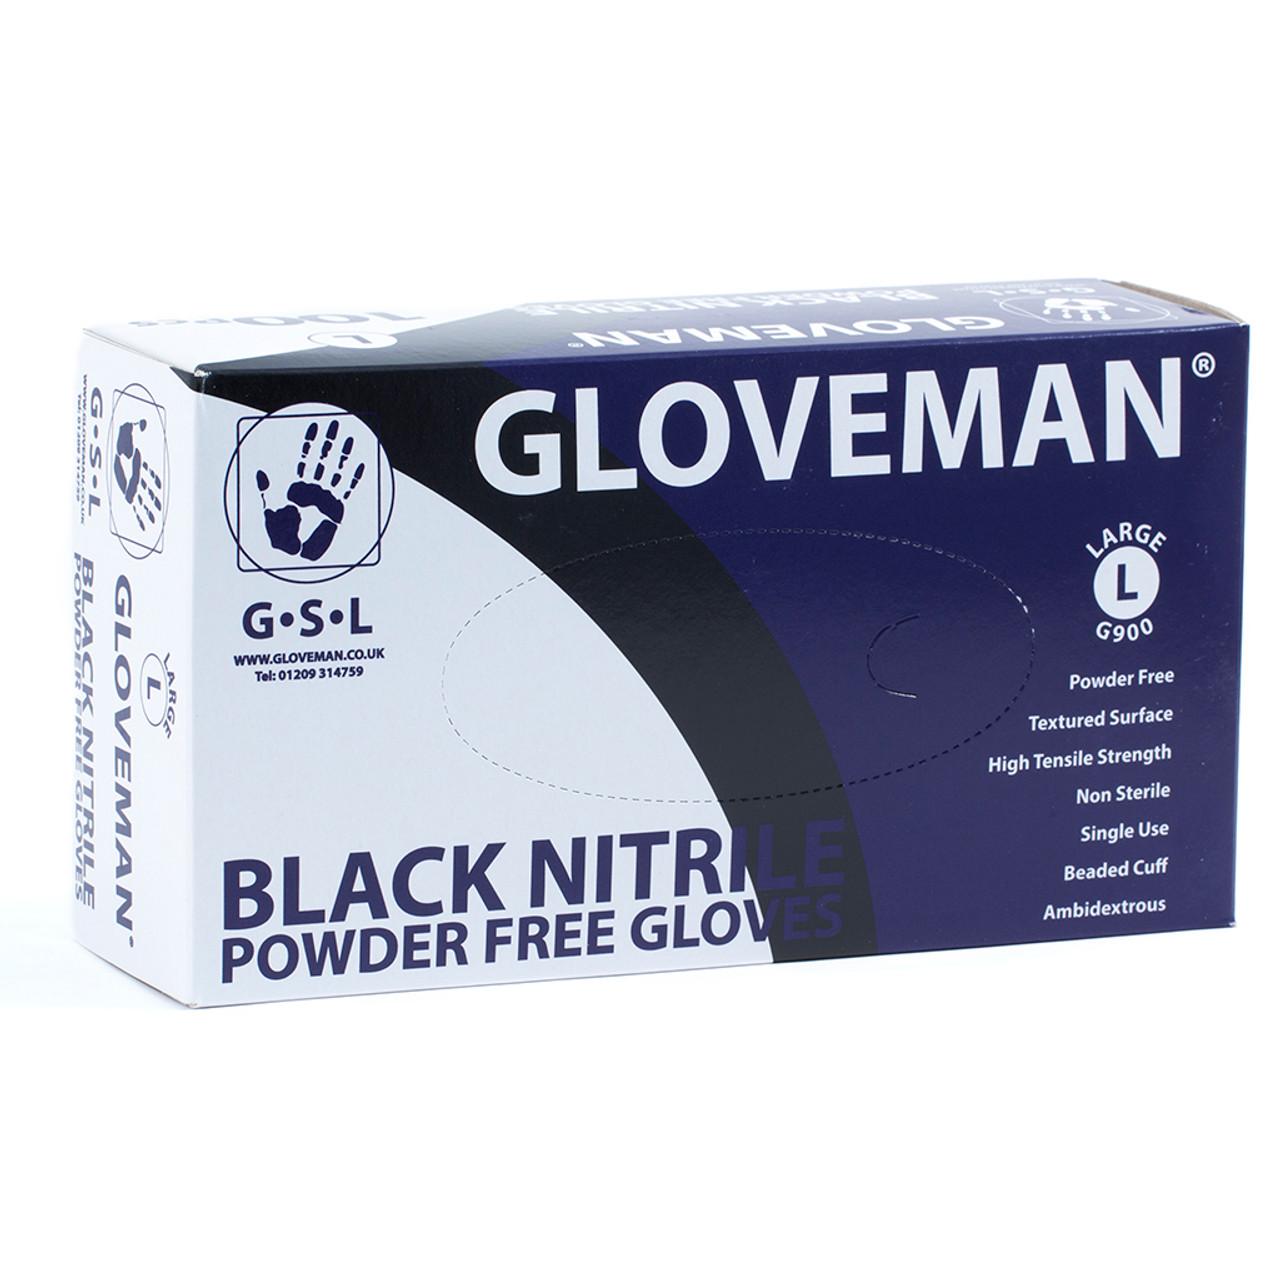 Black Nitriles Gloves